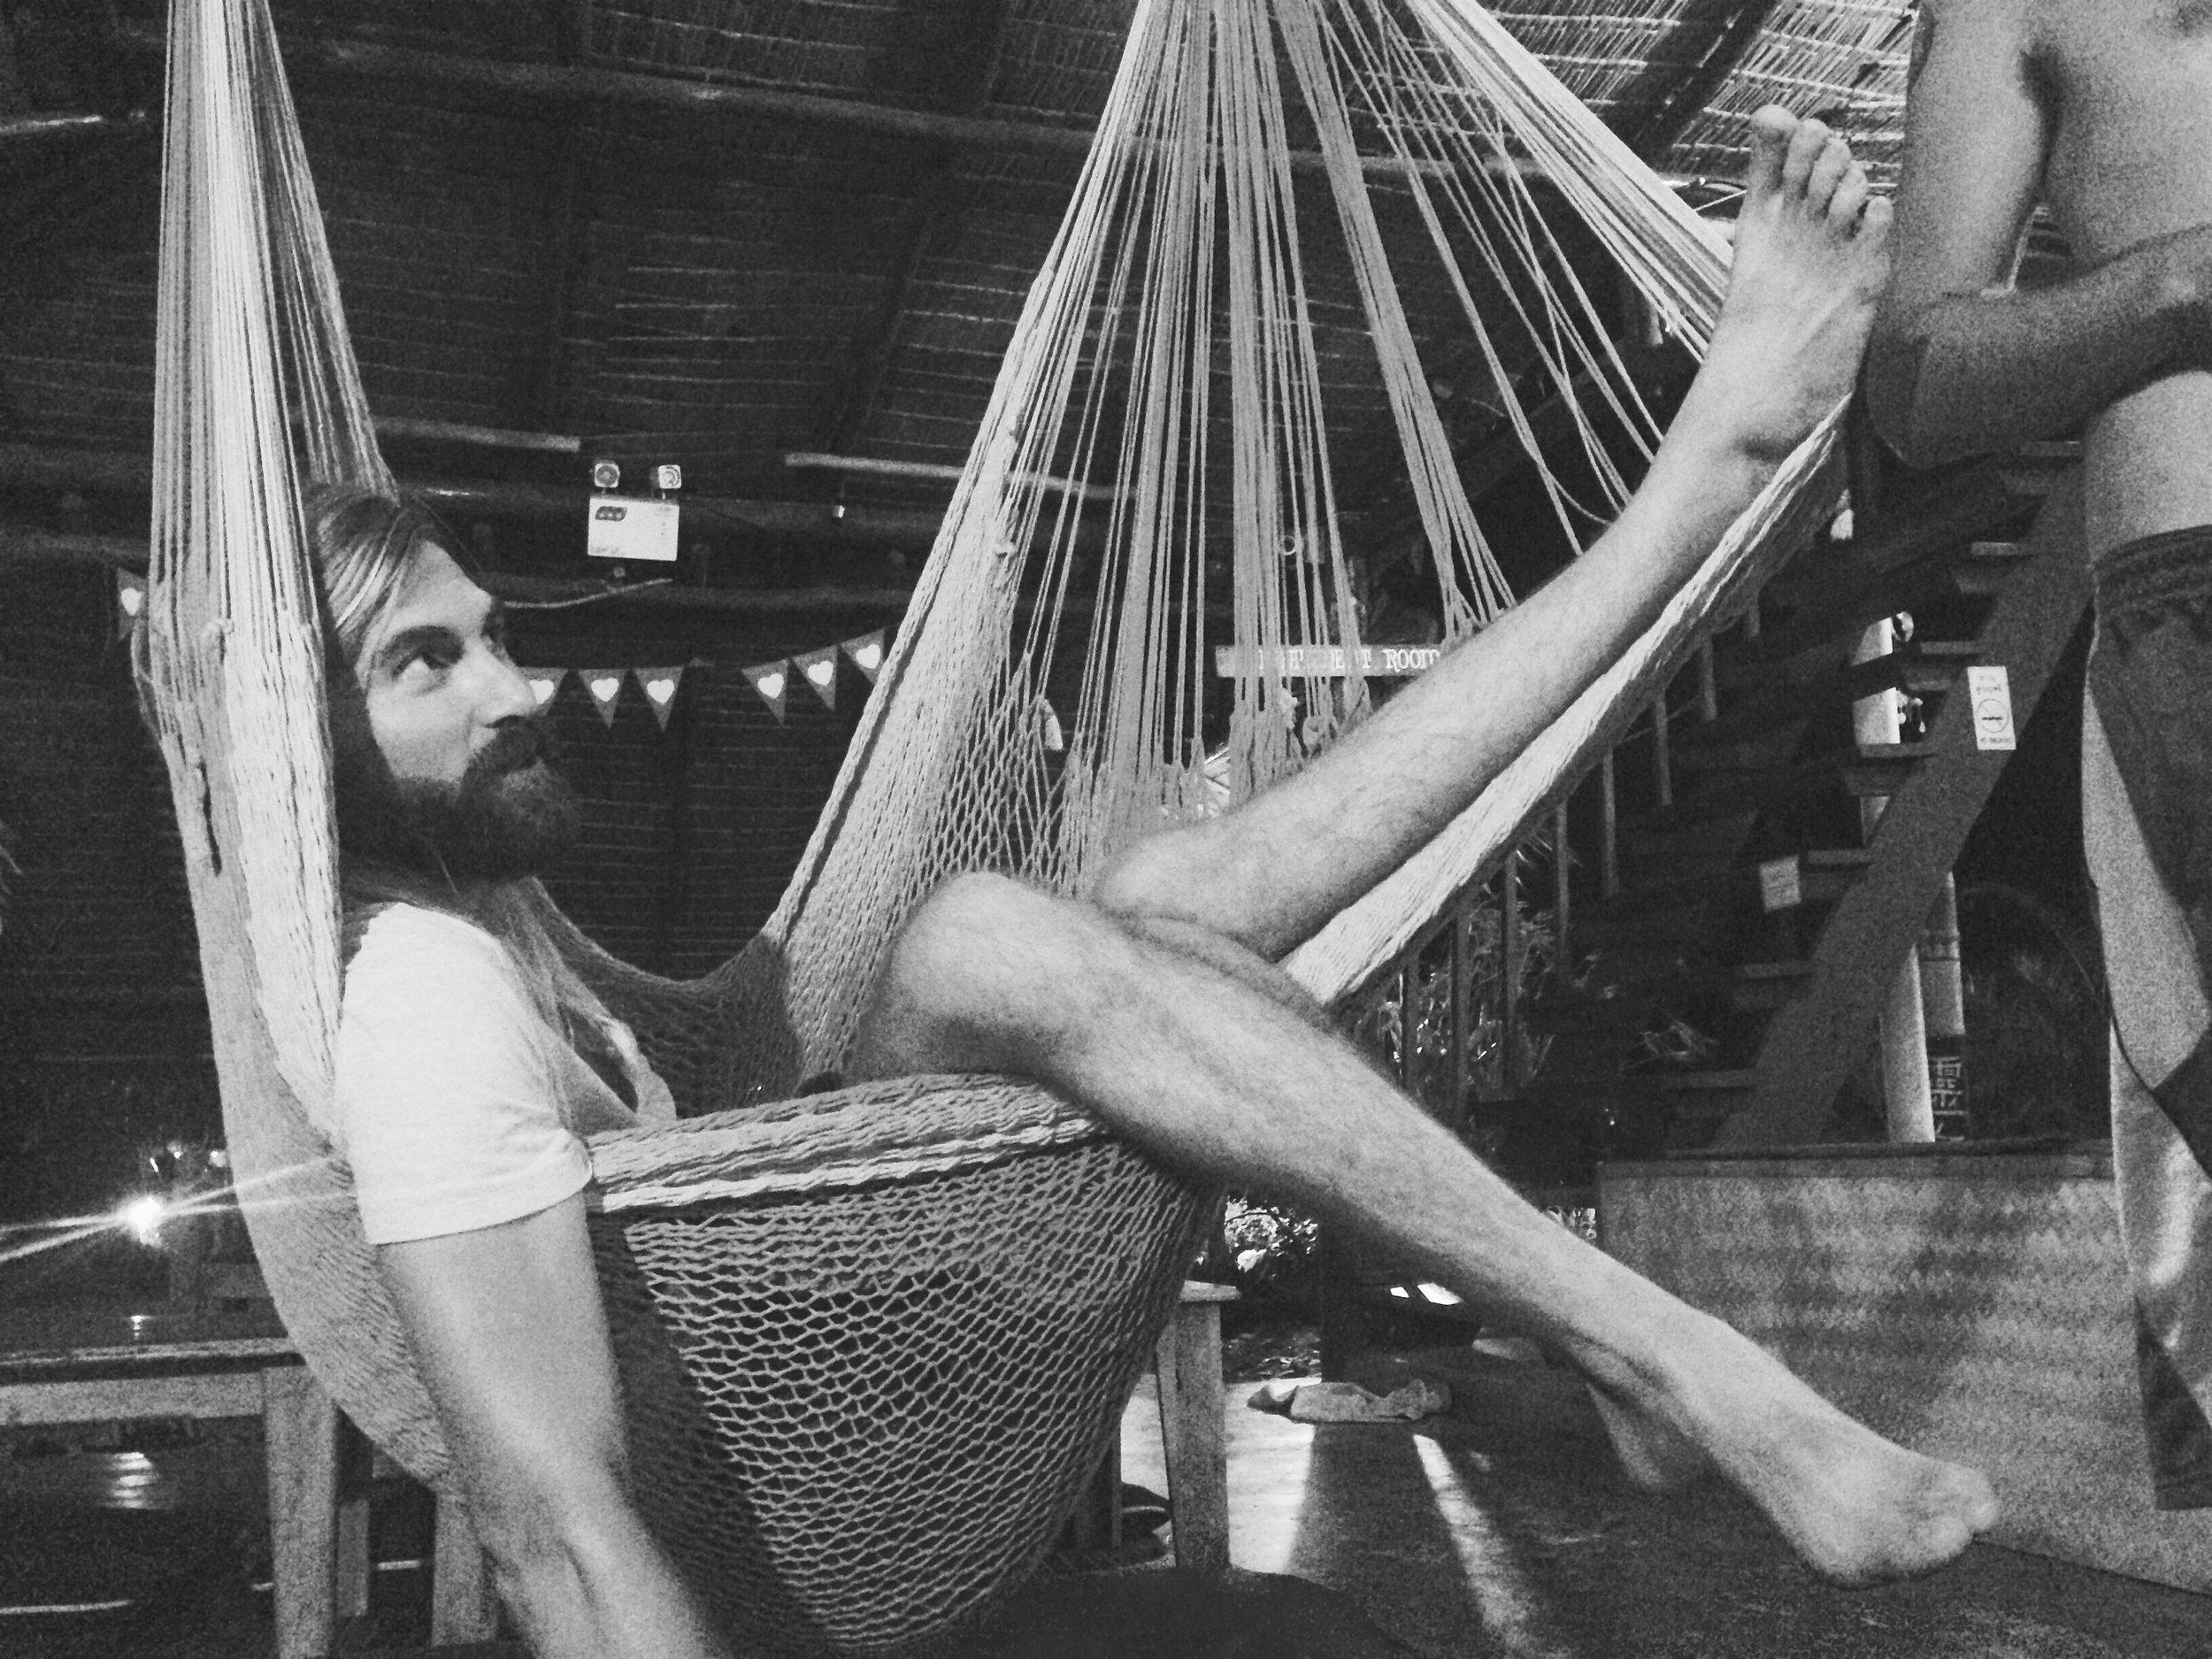 Rocking the hammock always